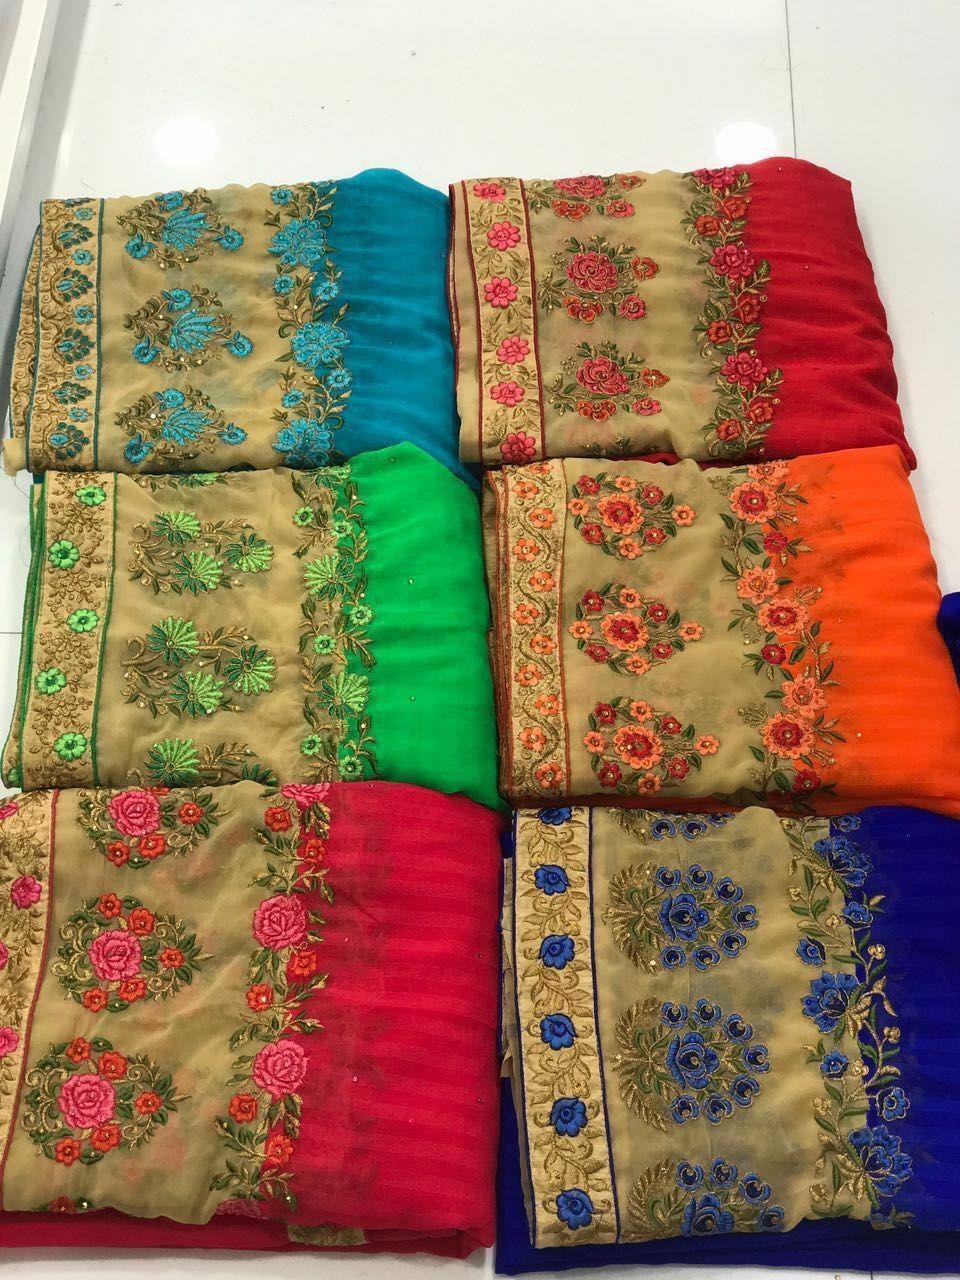 Yeola paithani saree images market  kum  pinterest  embroidery saree saree and blouse designs